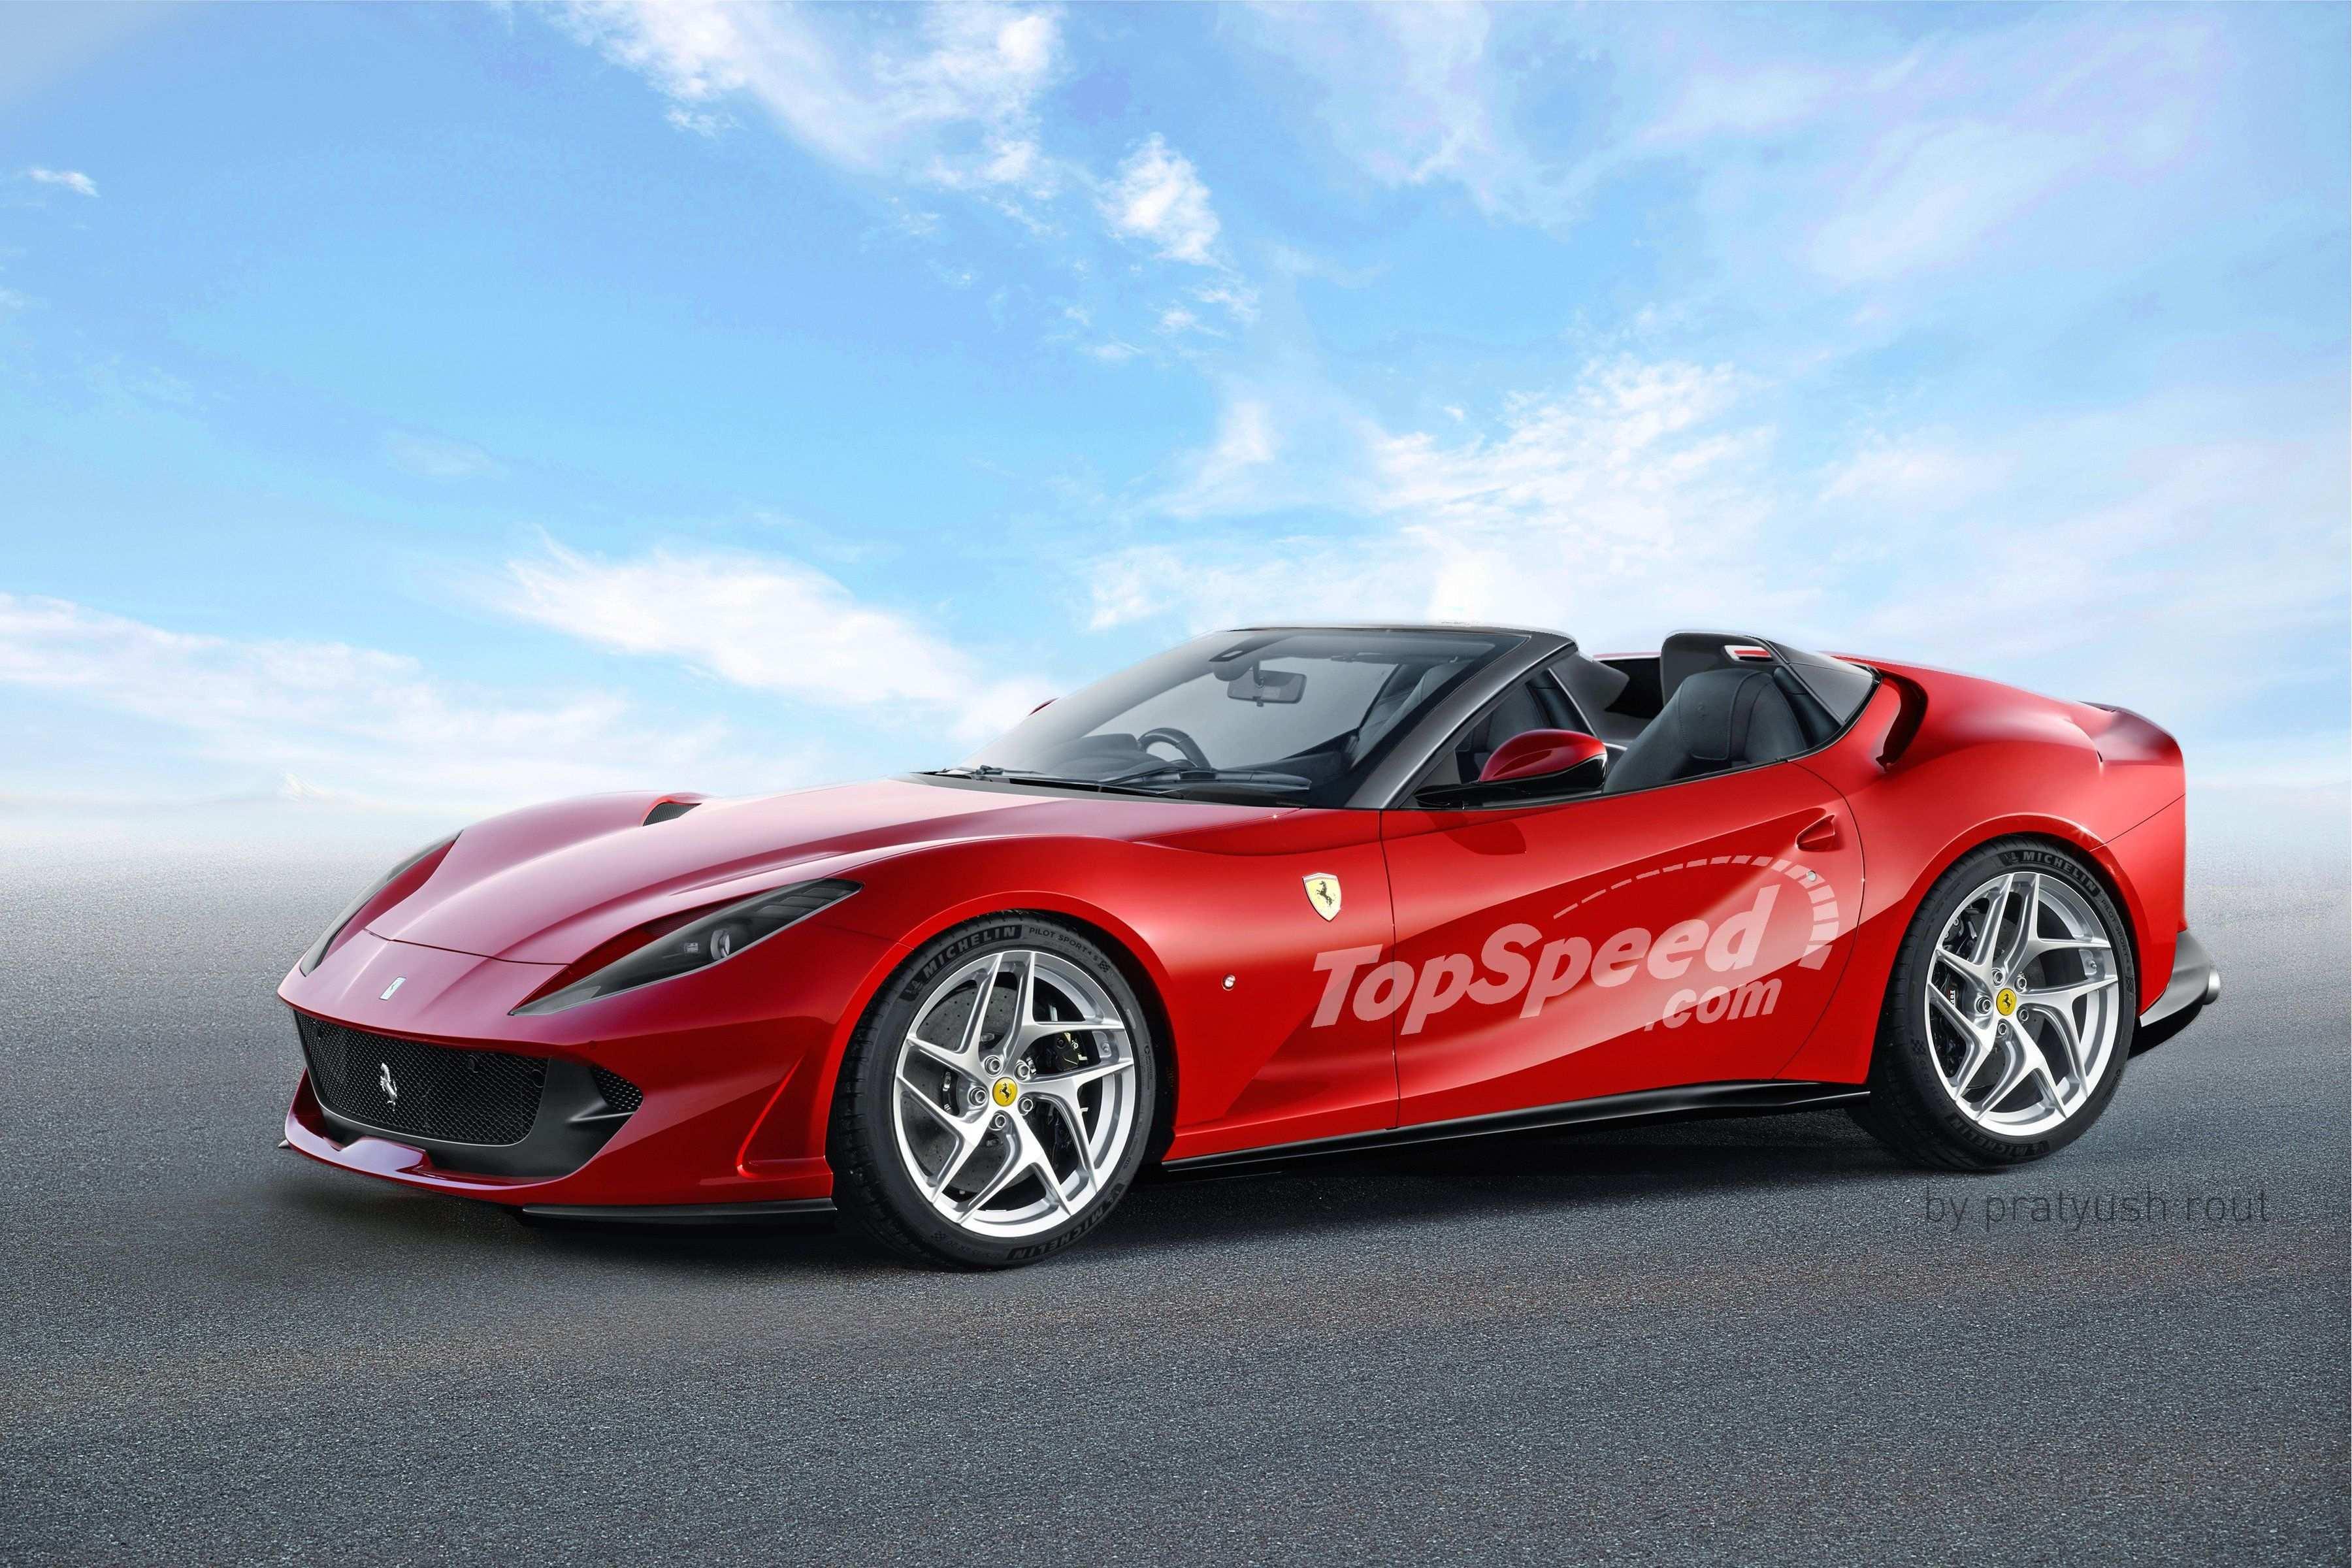 83 Best Review The La Nuova Ferrari 2019 First Drive Spy Shoot with The La Nuova Ferrari 2019 First Drive